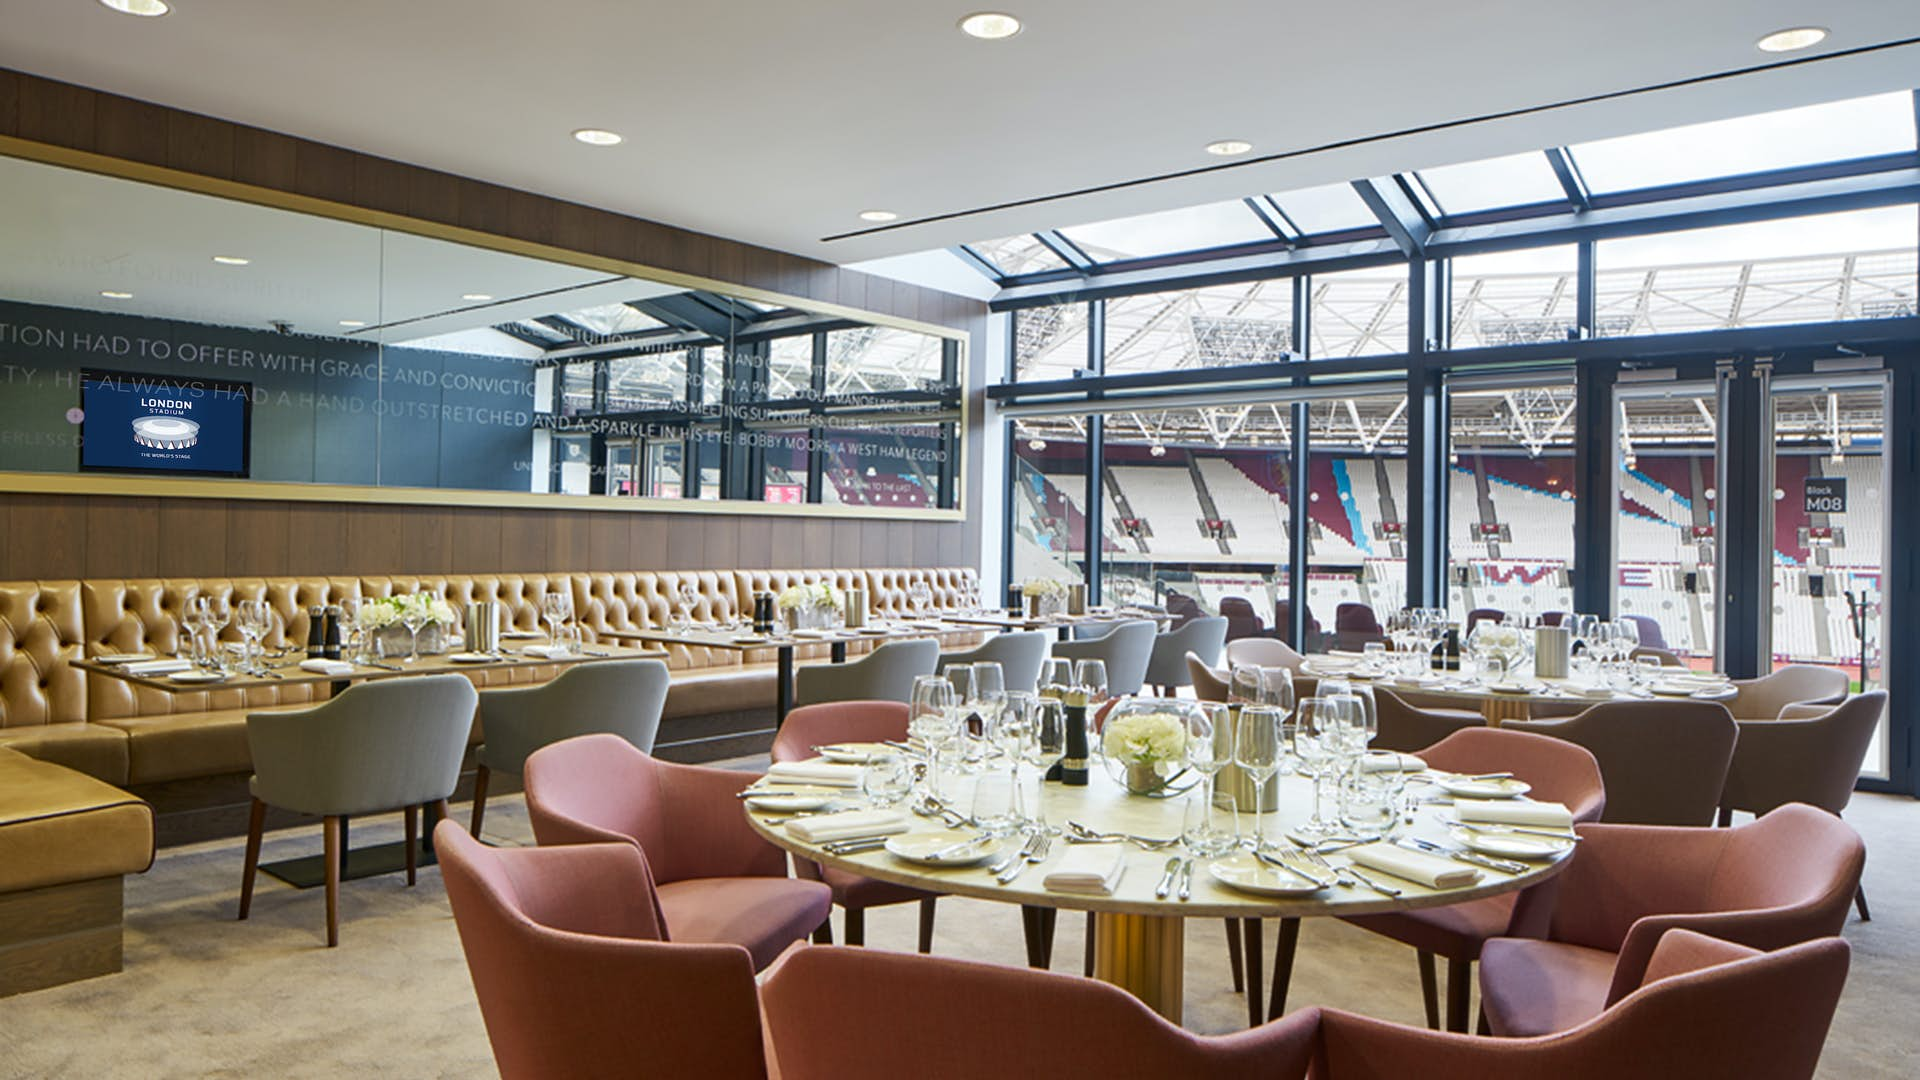 BM6 dining room with stadium view